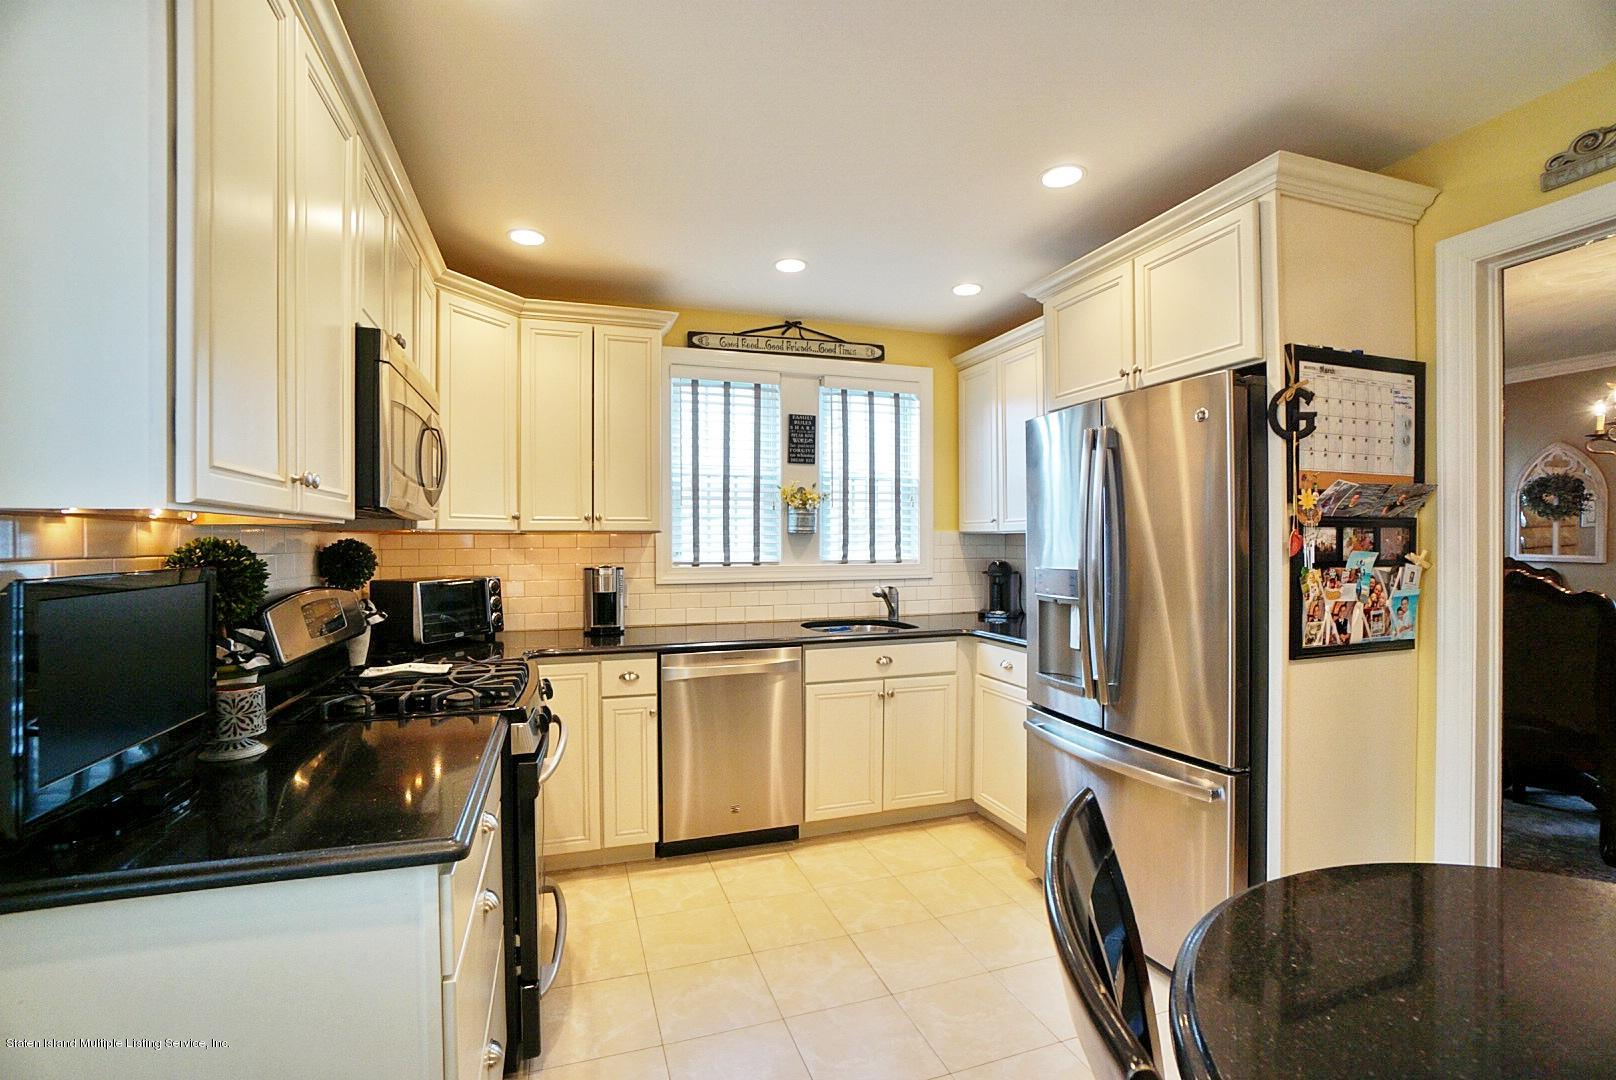 Single Family - Detached 171 Keiber Court  Staten Island, NY 10314, MLS-1127425-15